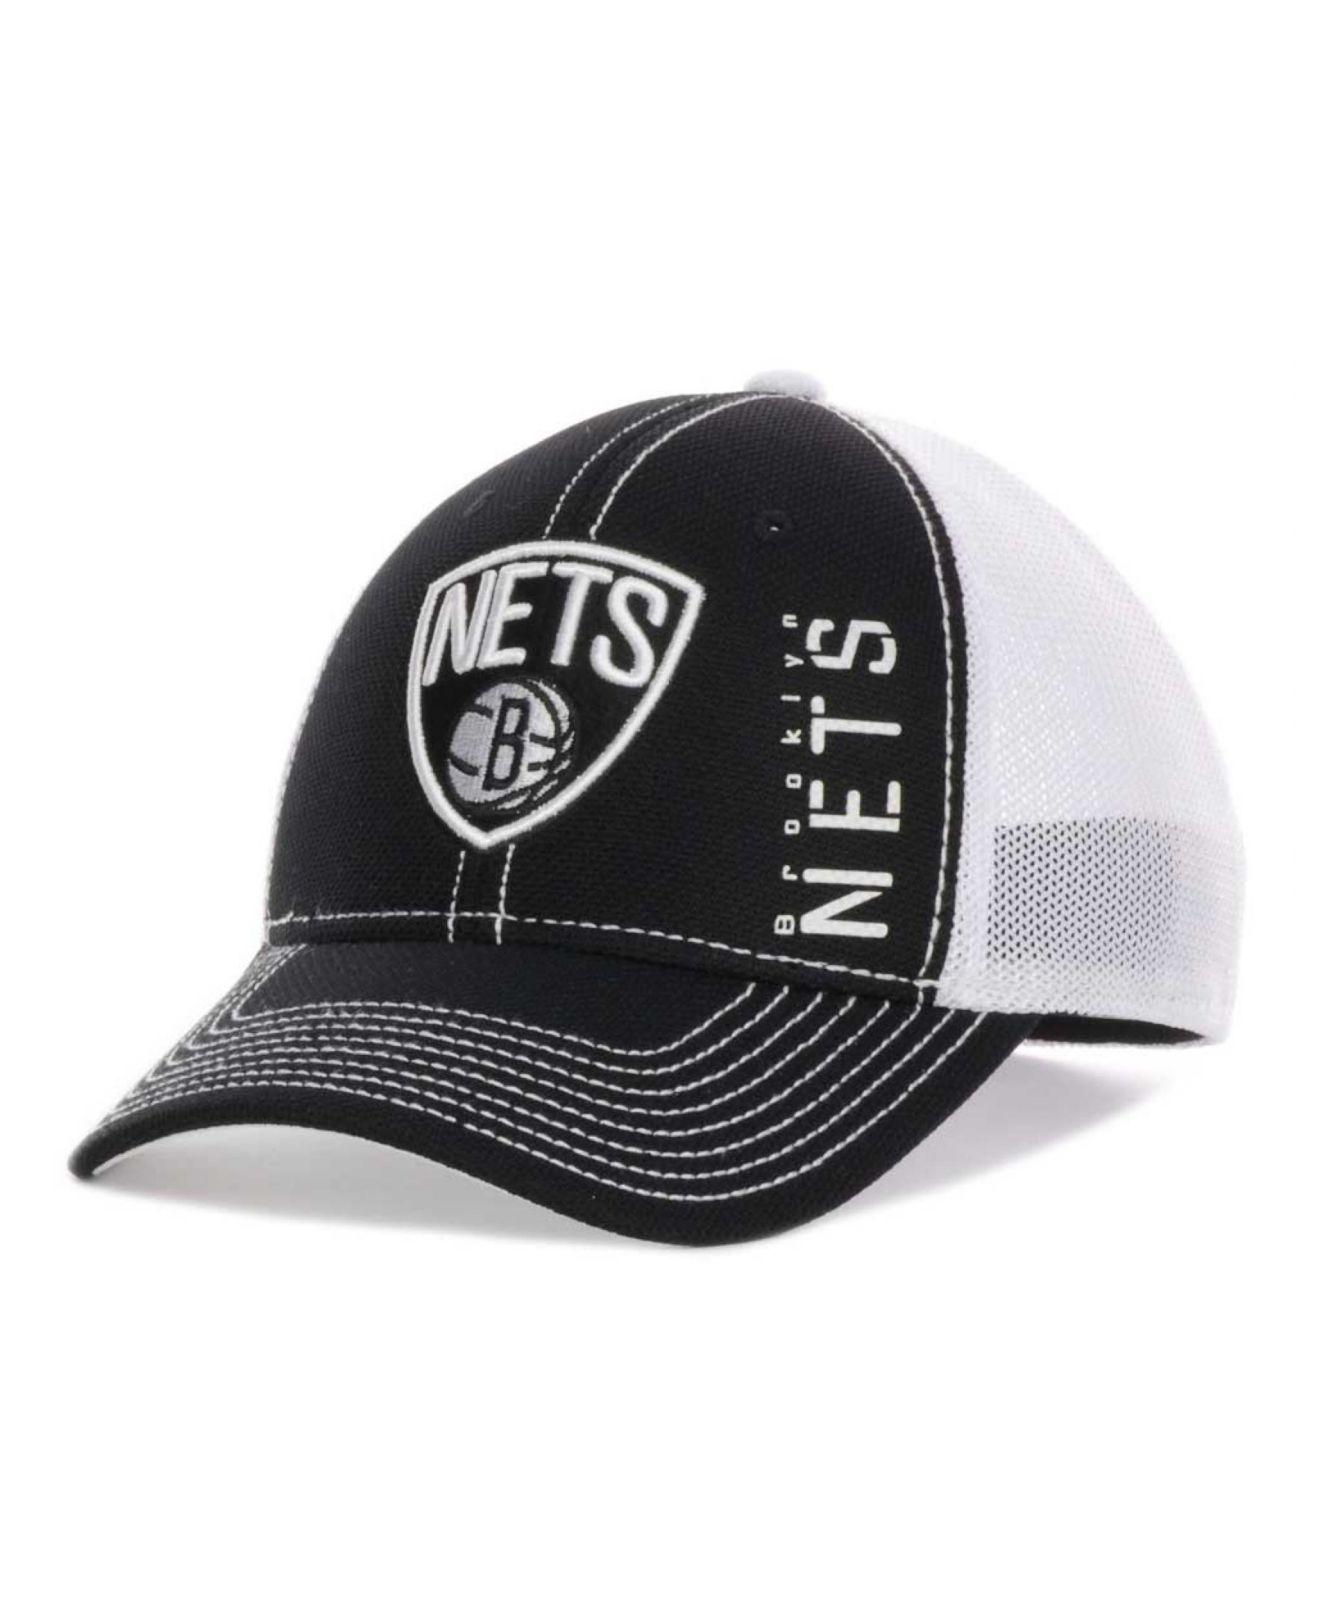 a4d3a17b287 Lyst - adidas Brooklyn Nets Nba Zone Mesh Cap in Black for Men